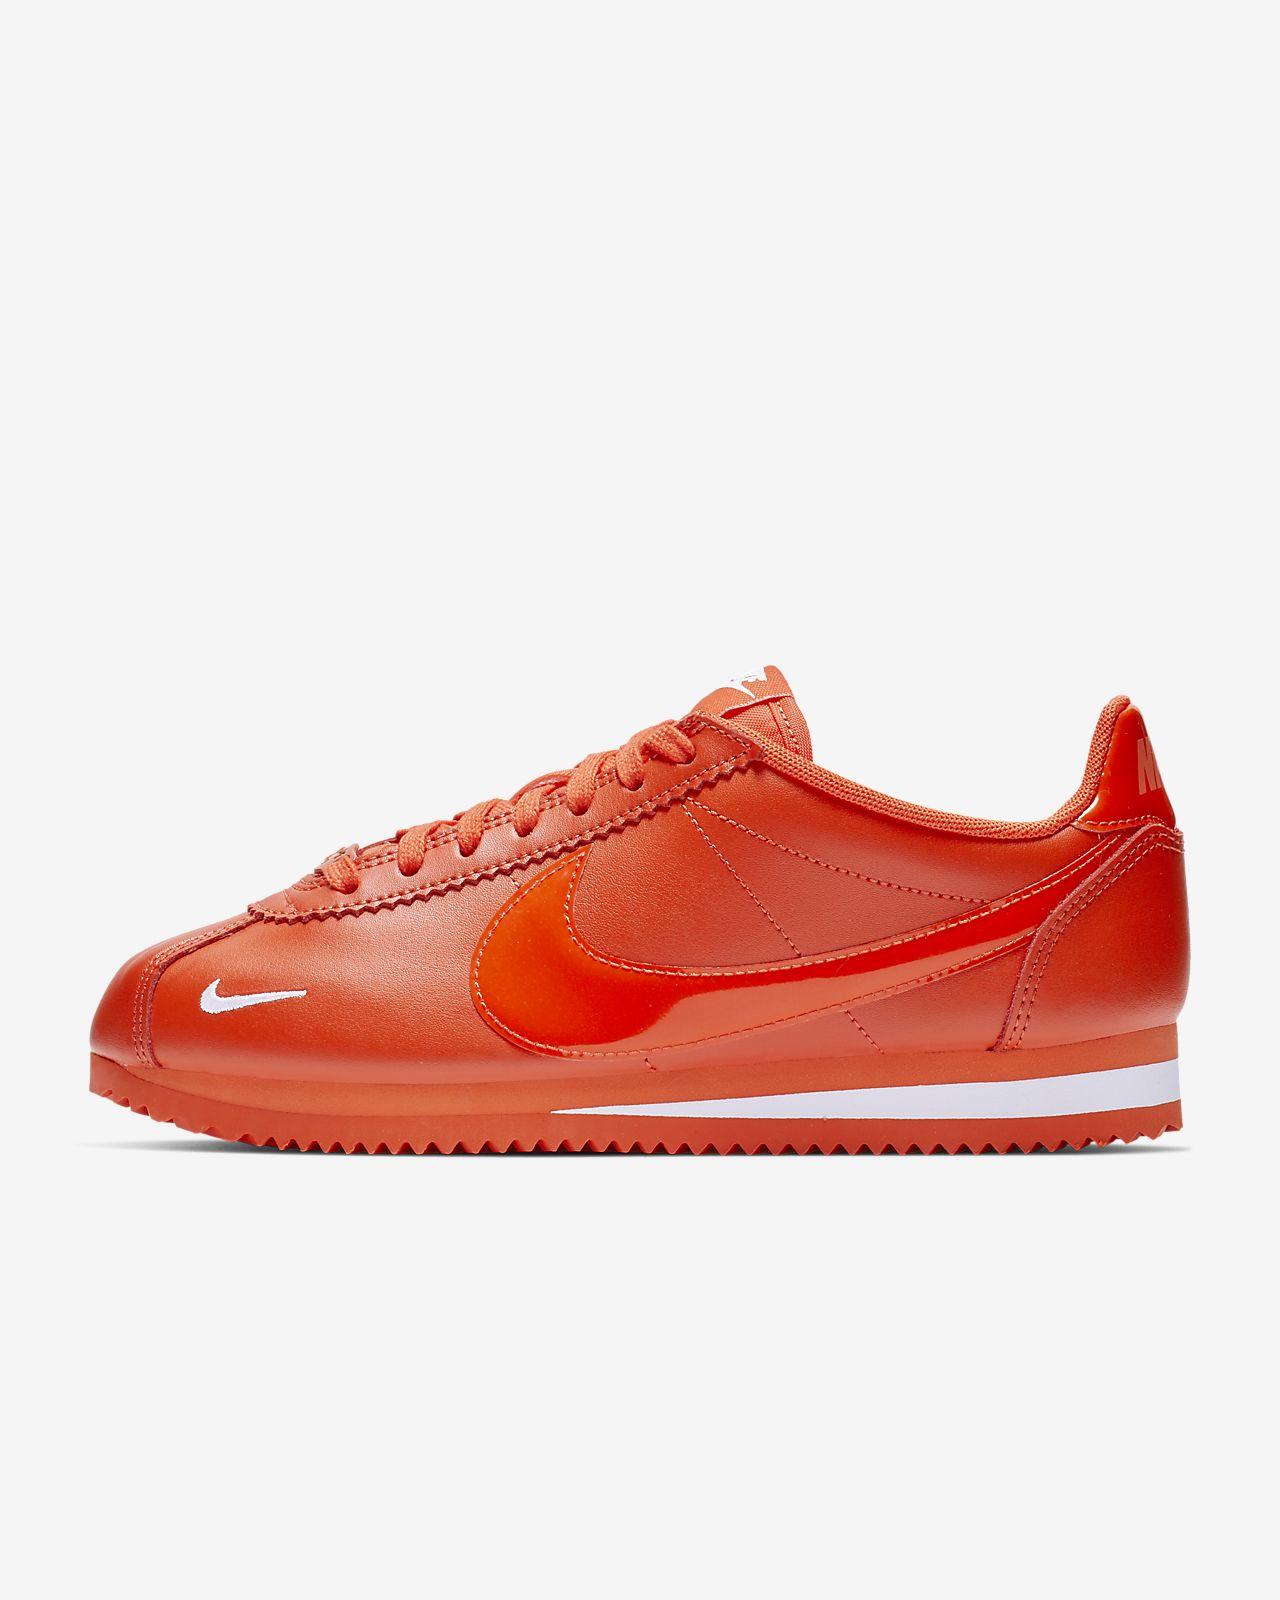 93aeea03452 Nike Classic Cortez Premium Women s Shoe. Nike.com ID